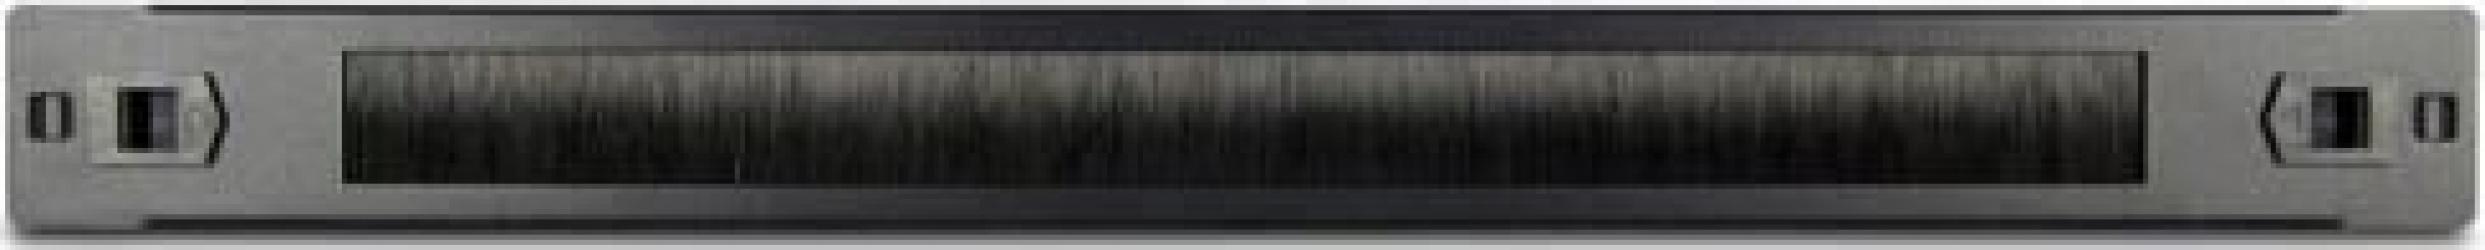 Masca cabluri Inter-Tech 88887280 Accesorii Server